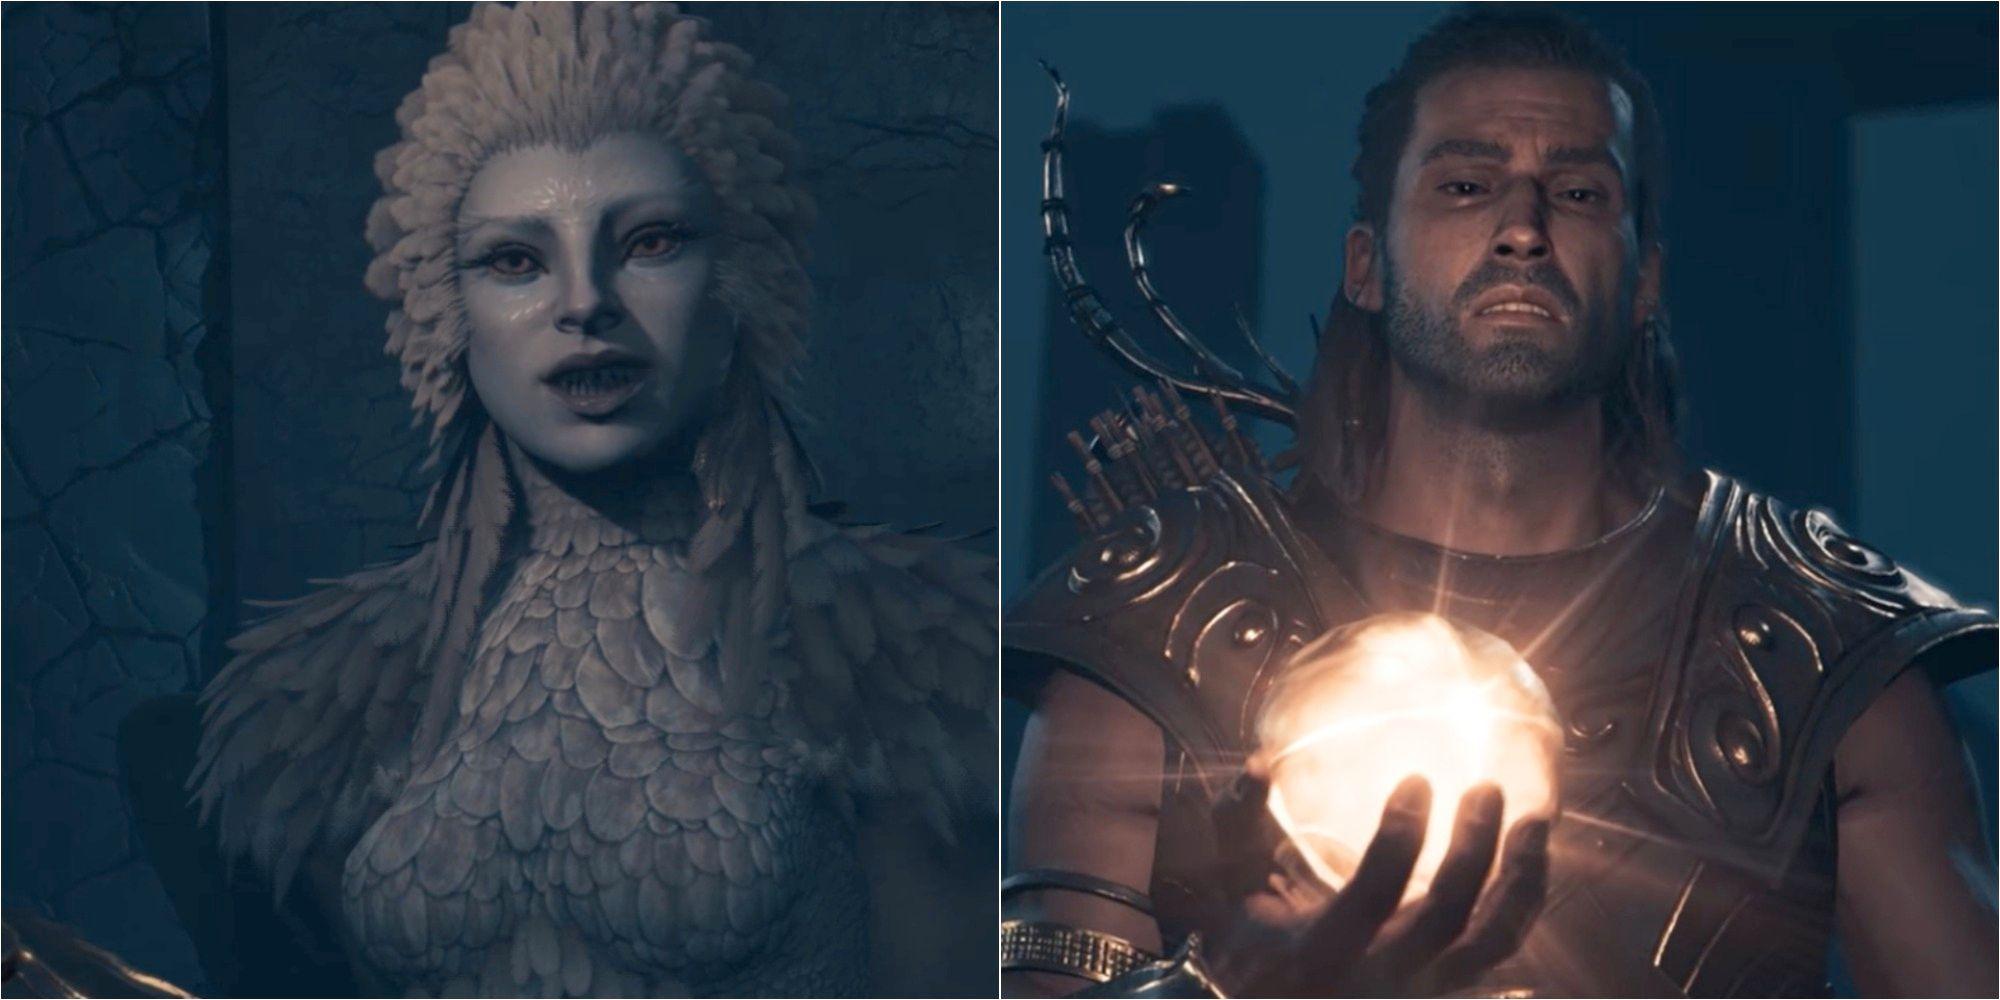 Assassin's Creed Odyssey: Awaken The Myth Quest Tutorial